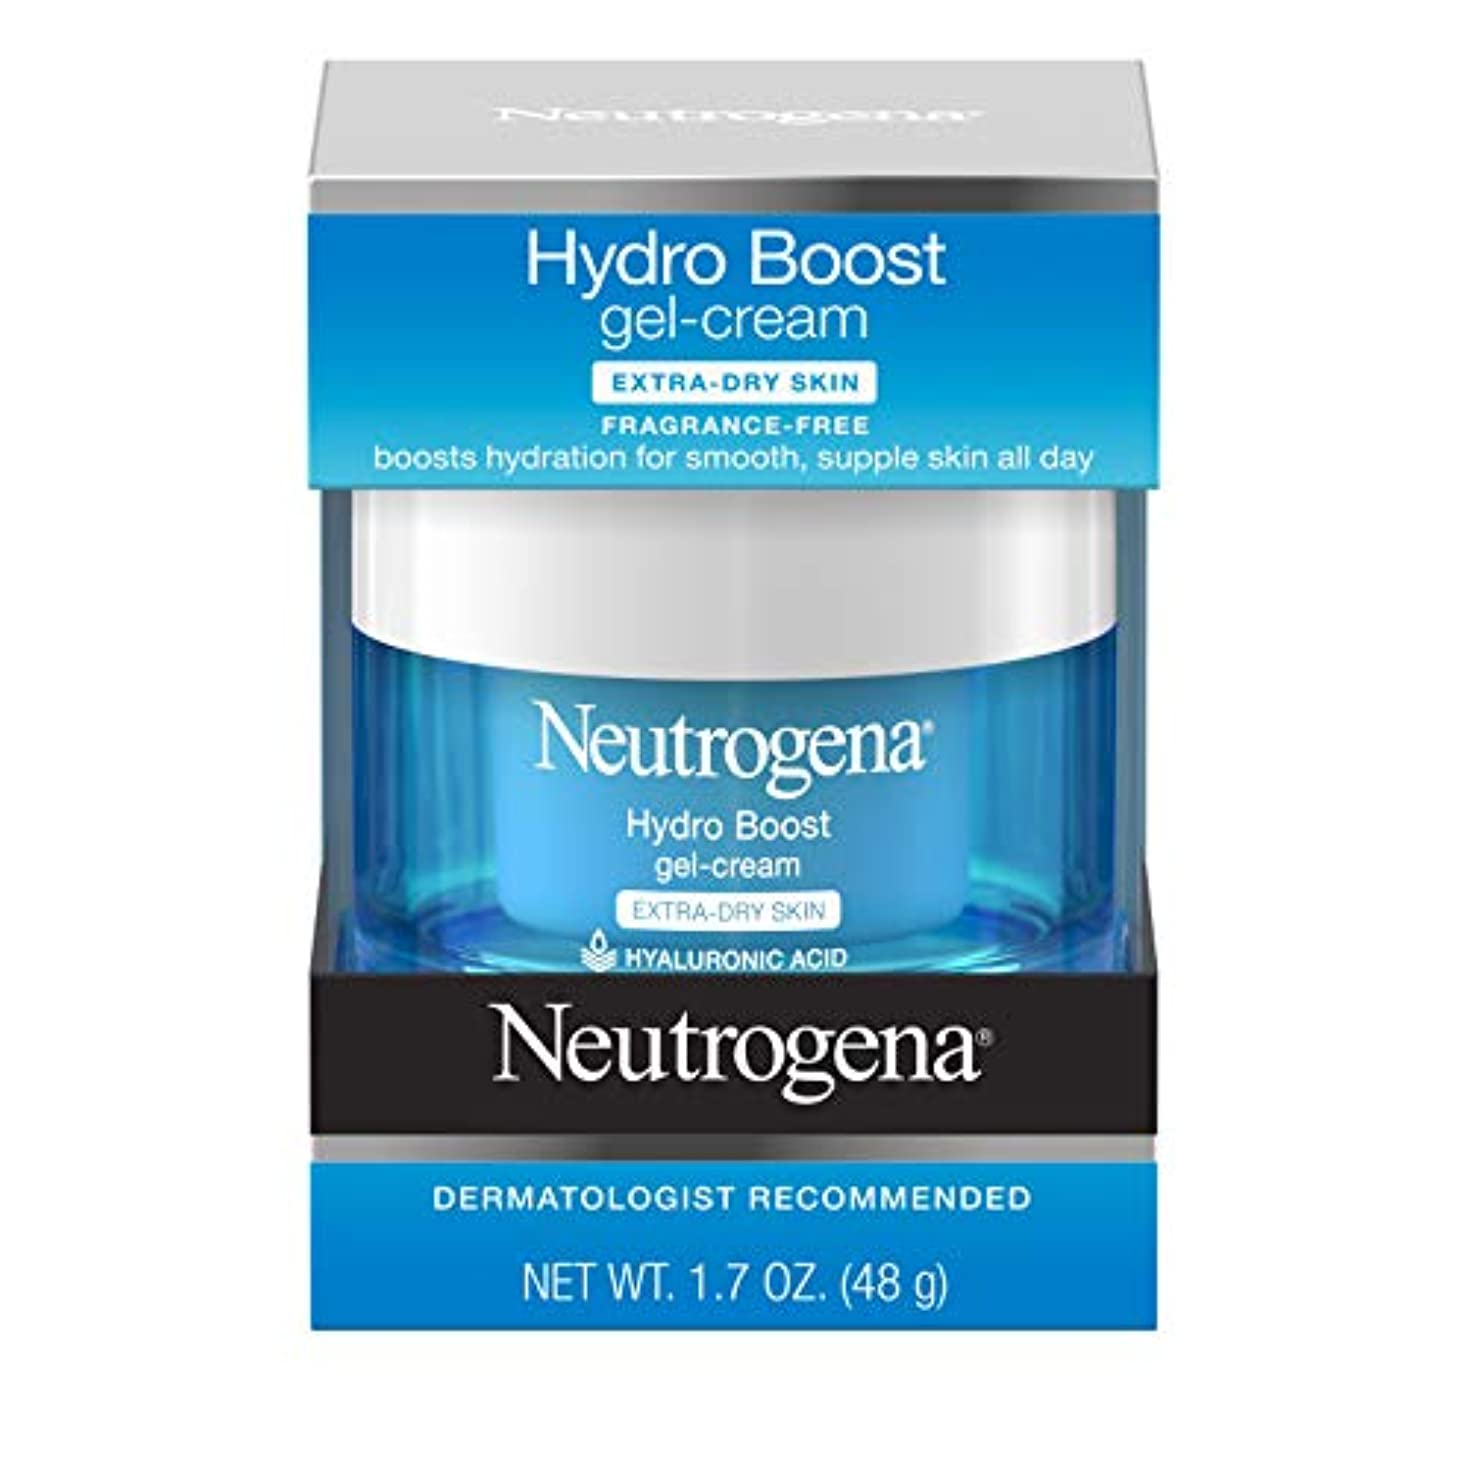 悪名高いの配列政治家のNeutrogena Hydro Boost Gel Cream, Extra Dry Skin, 1.7 Ounce  海外直送品?並行輸入品